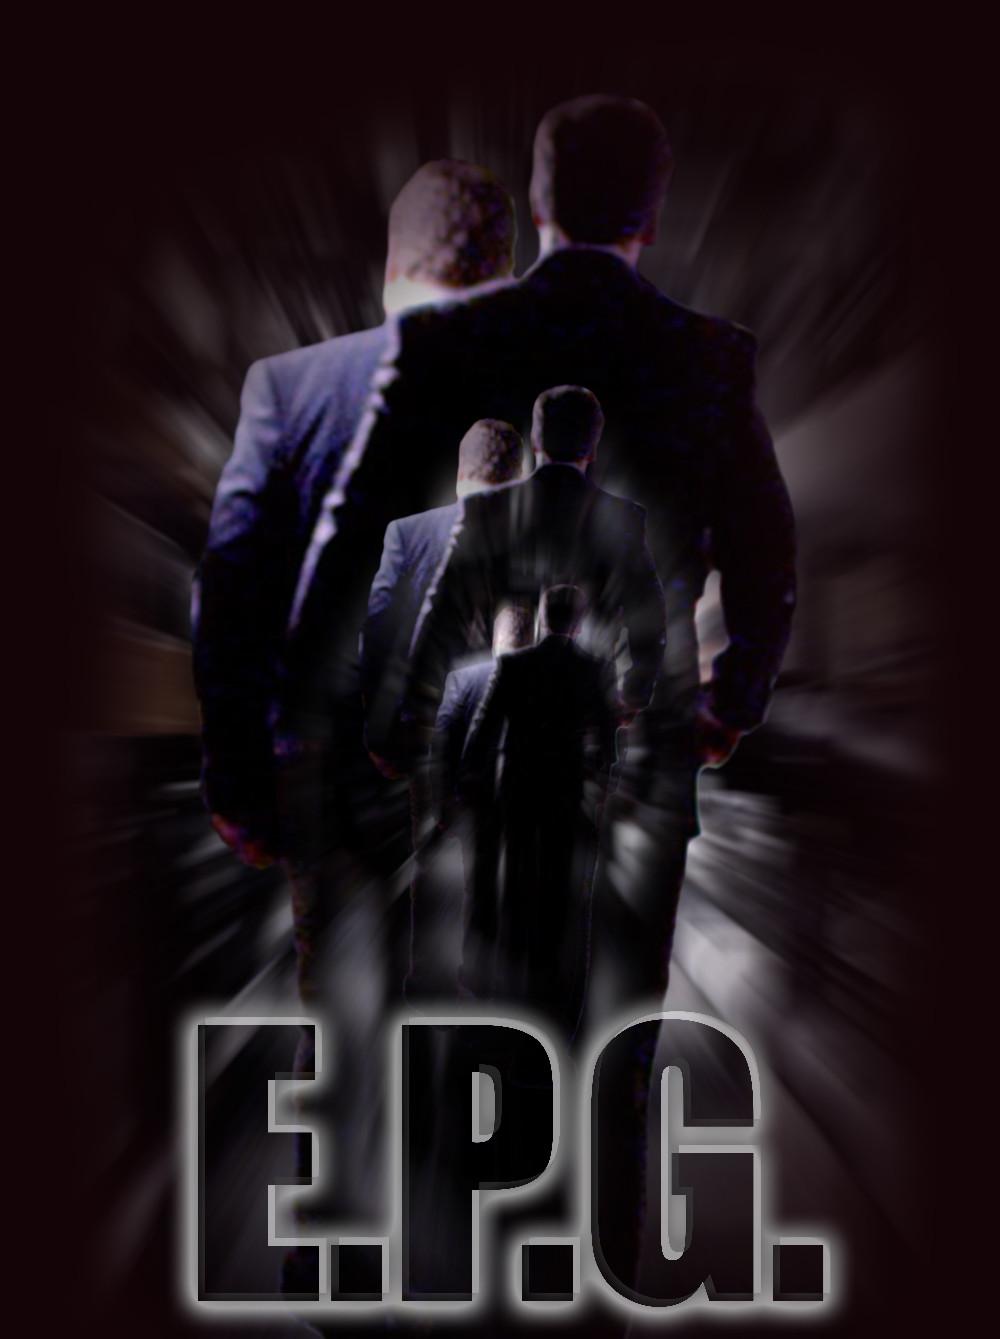 E.P.G. KEY ART #7 - Qikfinger Films / Pinnacle Graphics